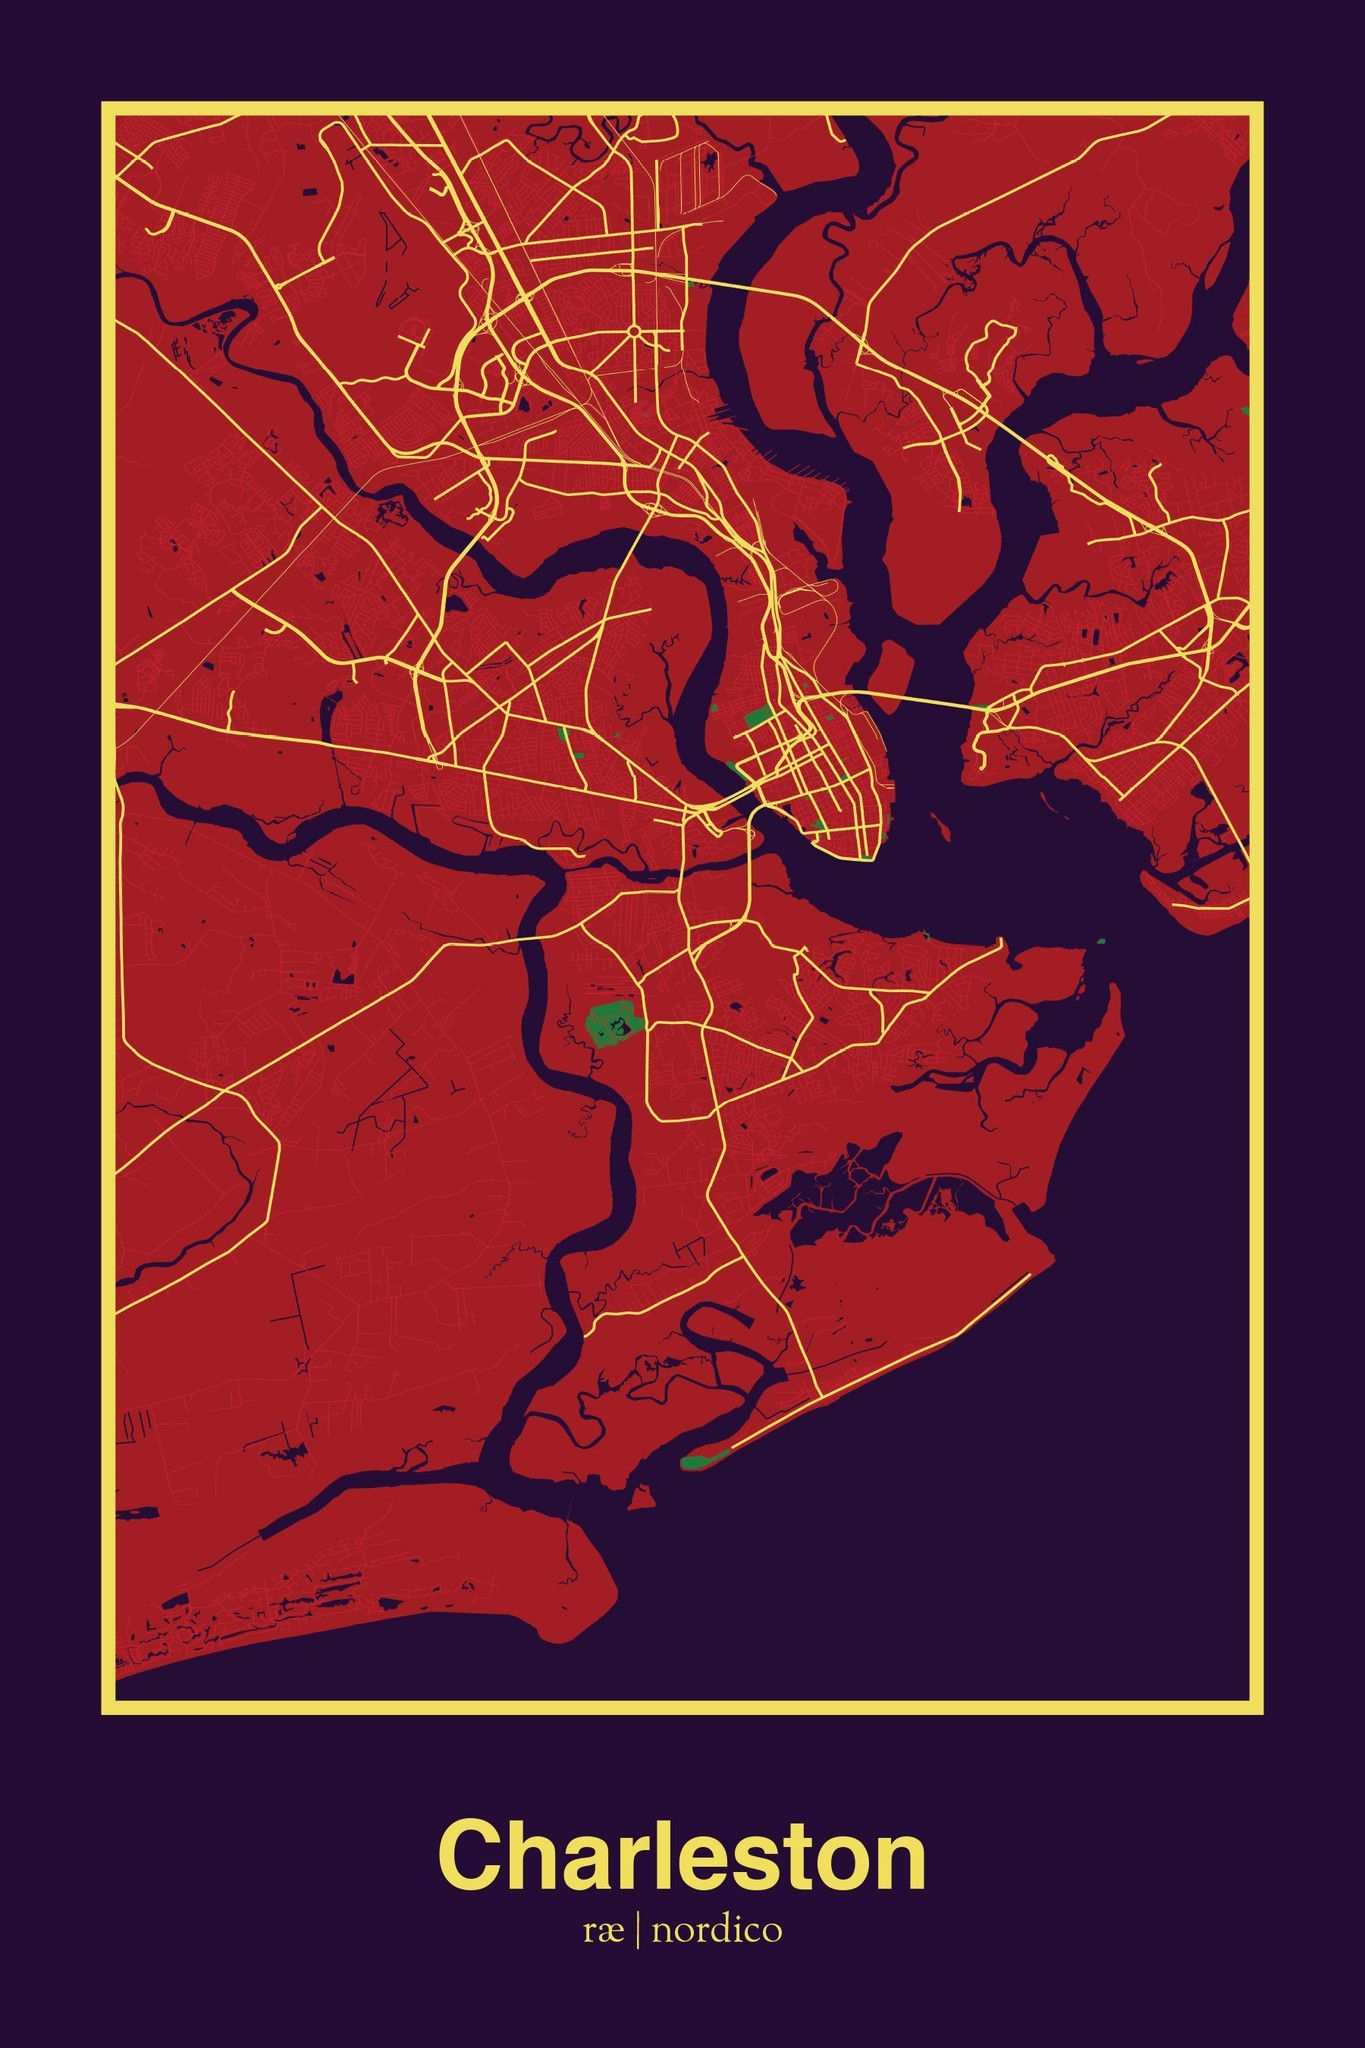 charleston usa map print nearby pinterest charleston usa